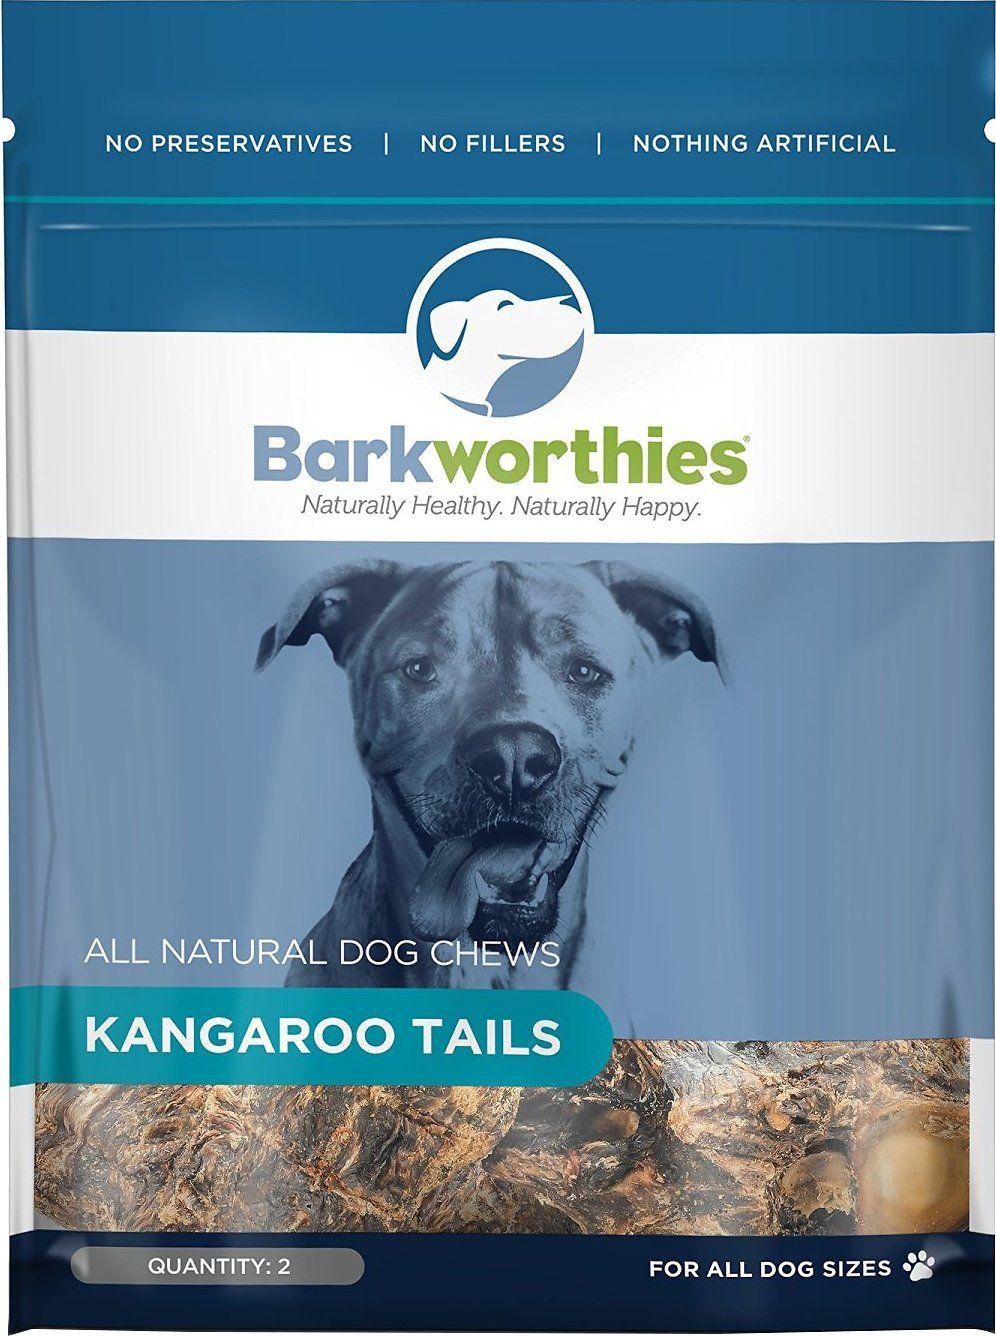 Barkworthies natural kangaroo tails are an allnatural